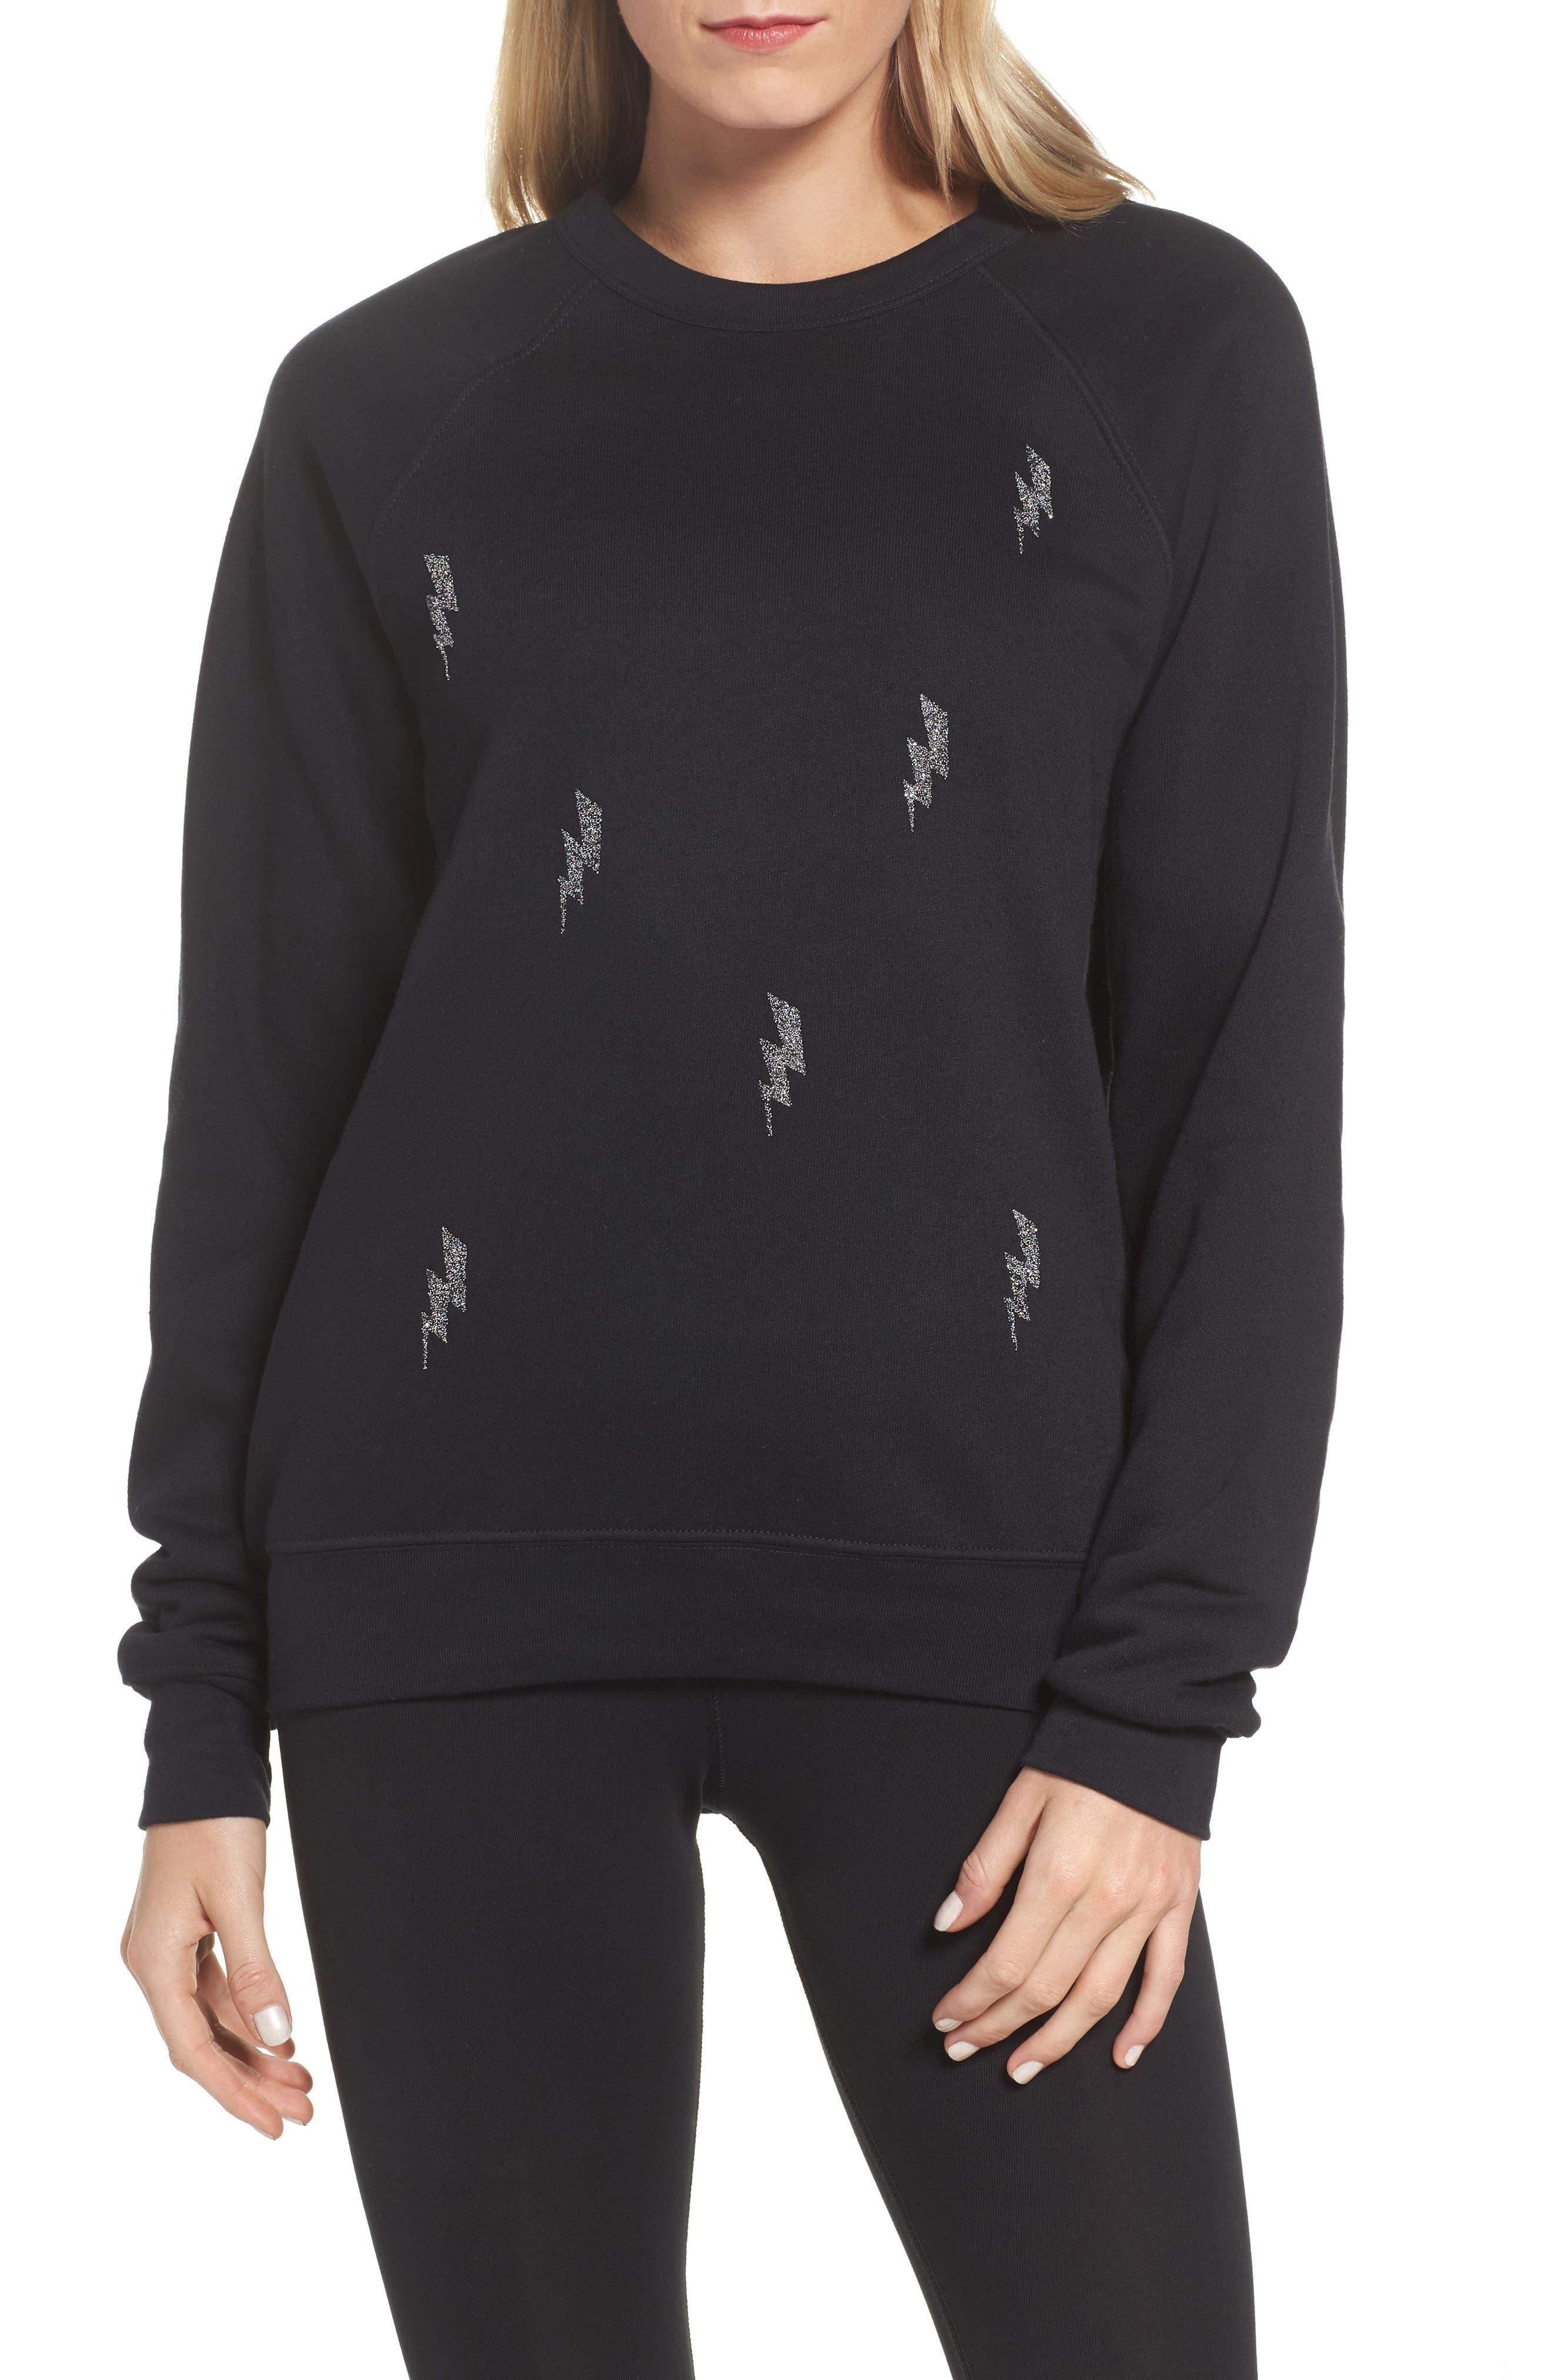 Swarovski Bolt Sweatshirt,                         Main,                         color, 001